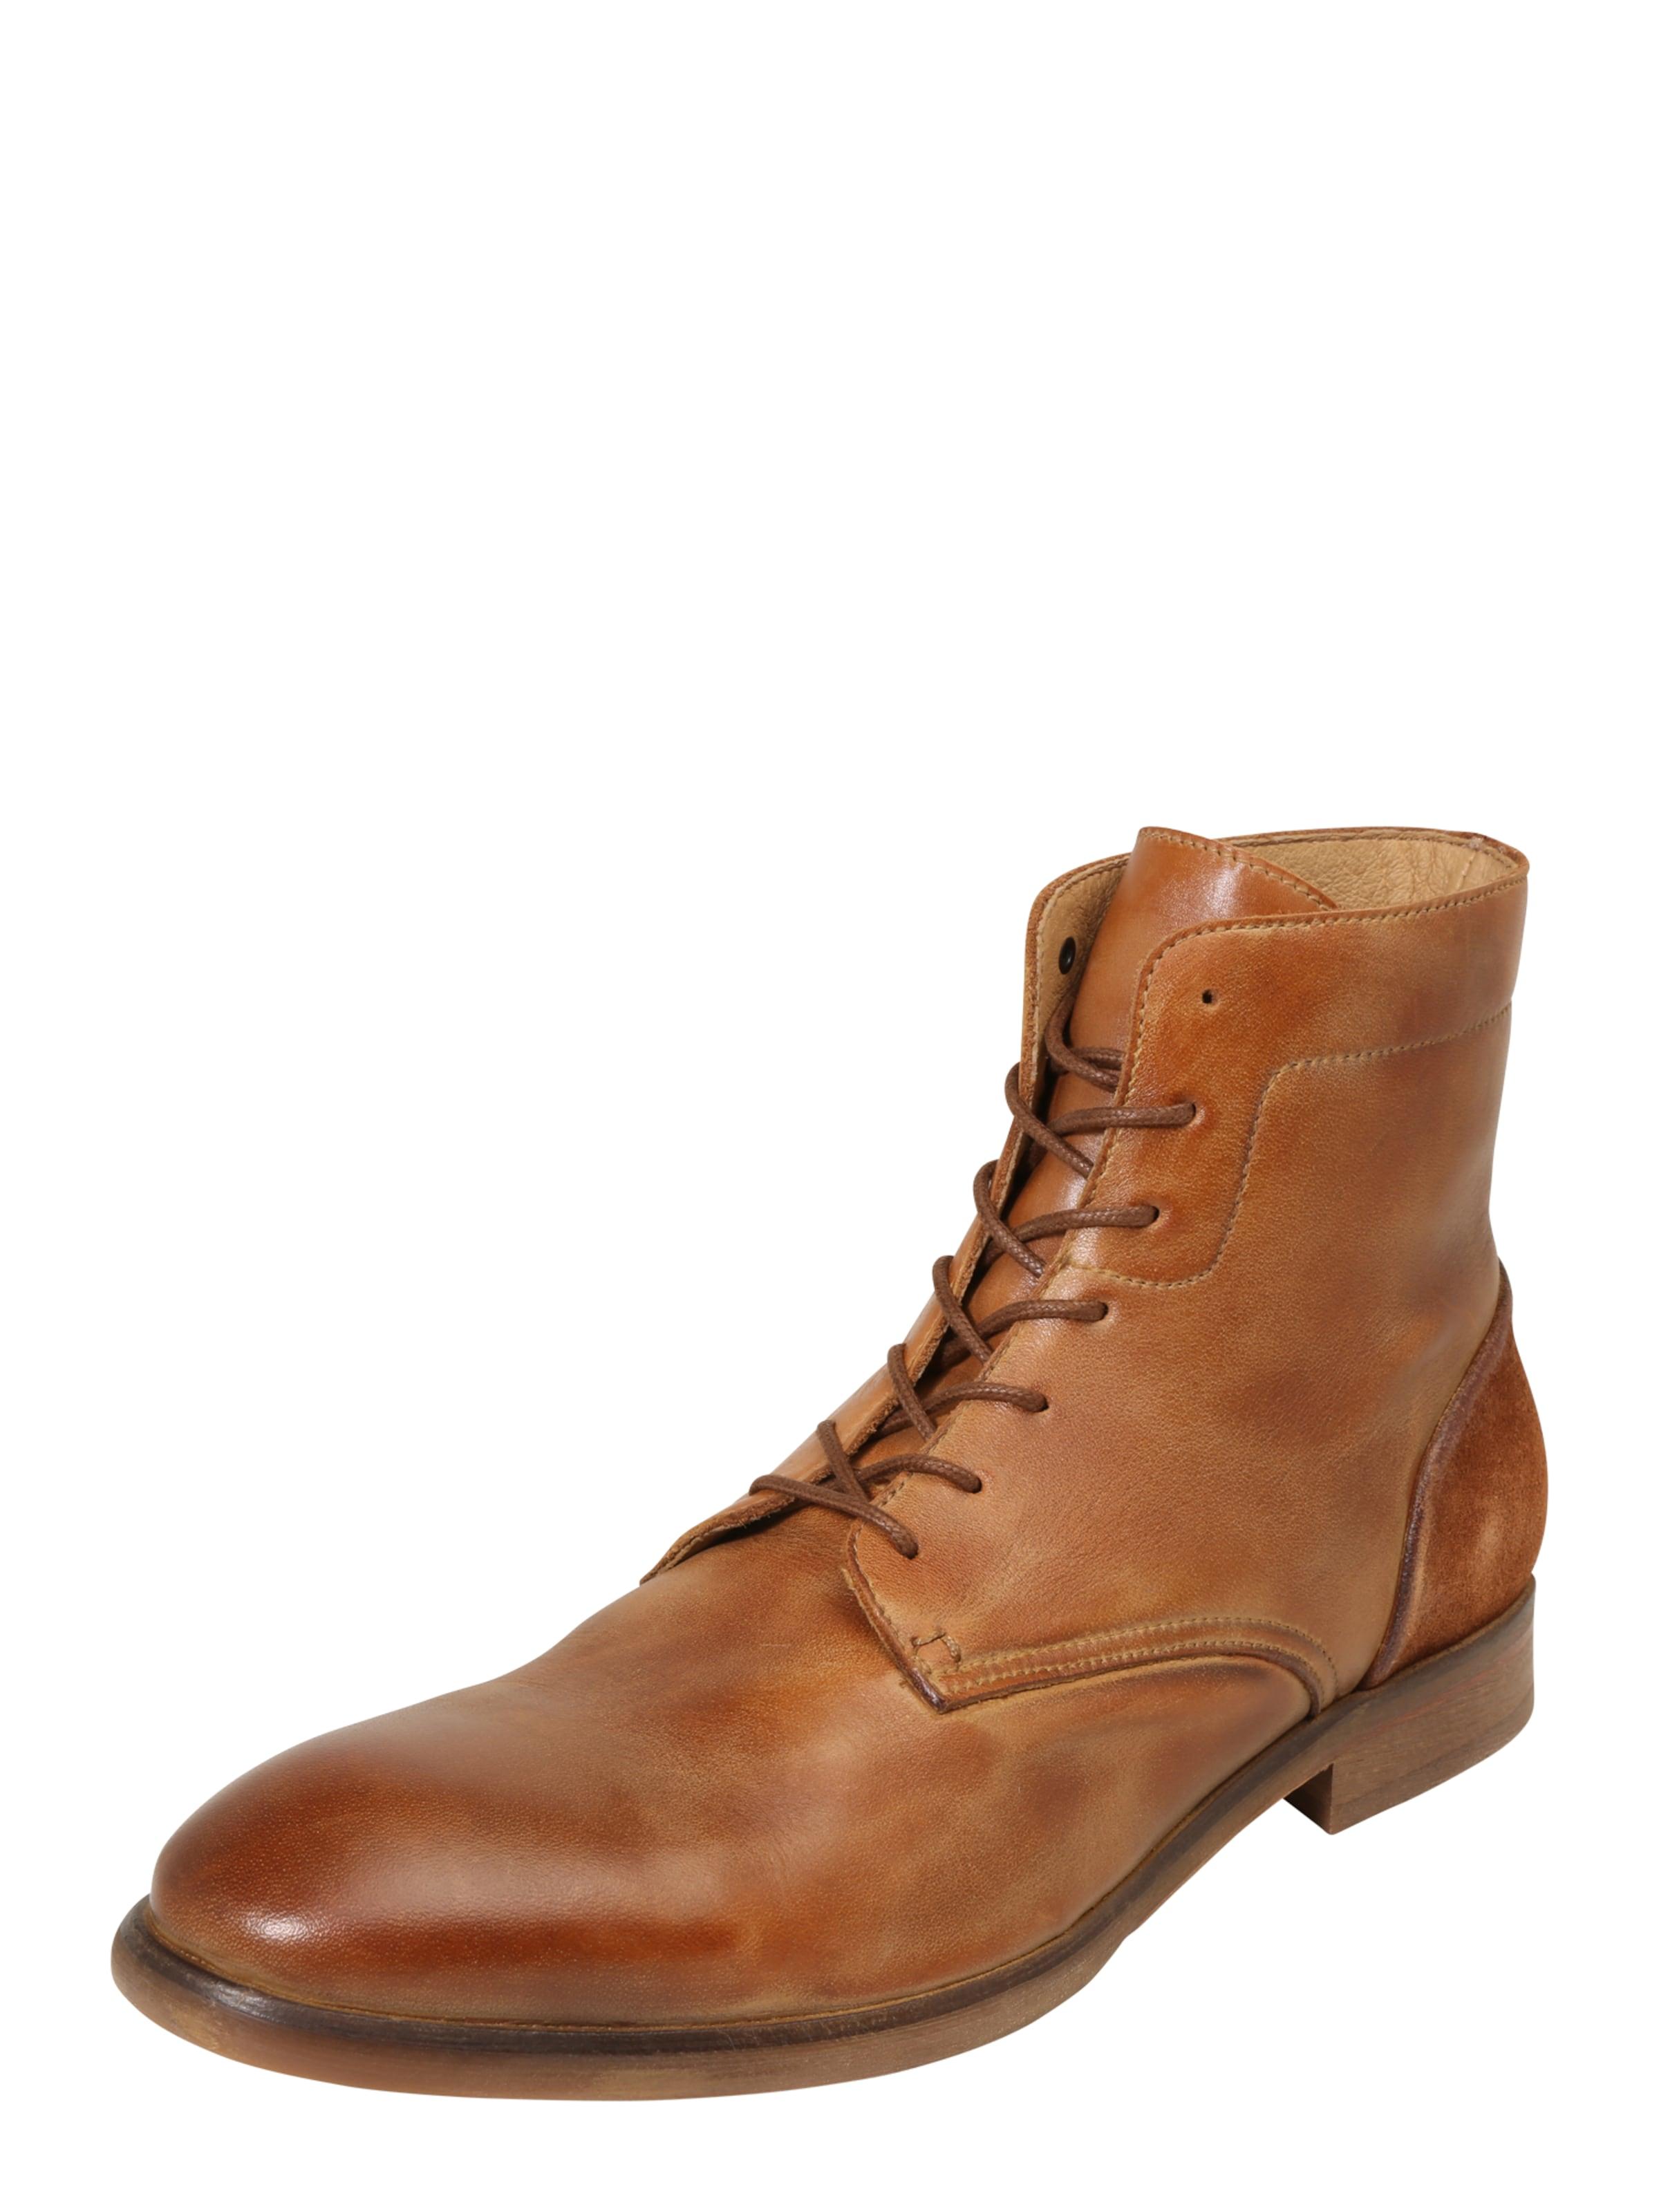 Haltbare Mode Schuhe billige Schuhe Hudson London   Schnürstiefel 'Yoakley' Schuhe Mode Gut getragene Schuhe 291e02